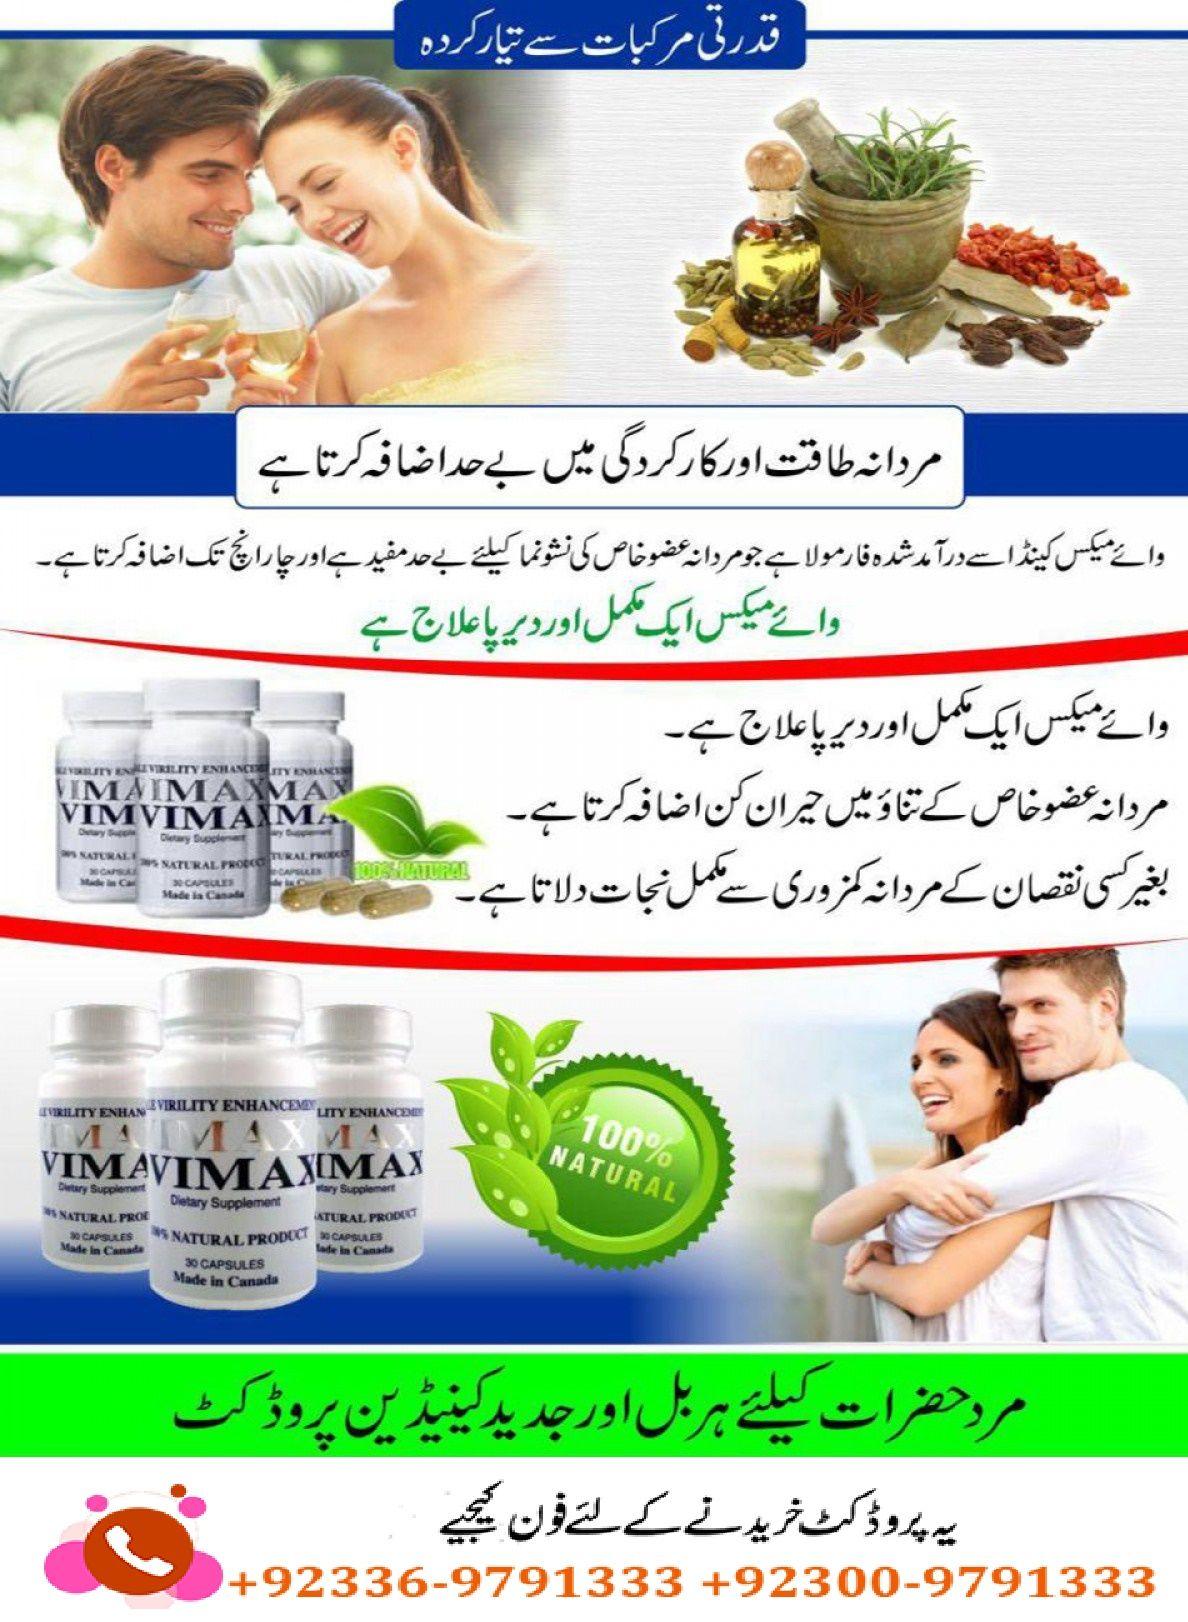 vimax price in peshawar with izon code vimax pills price in